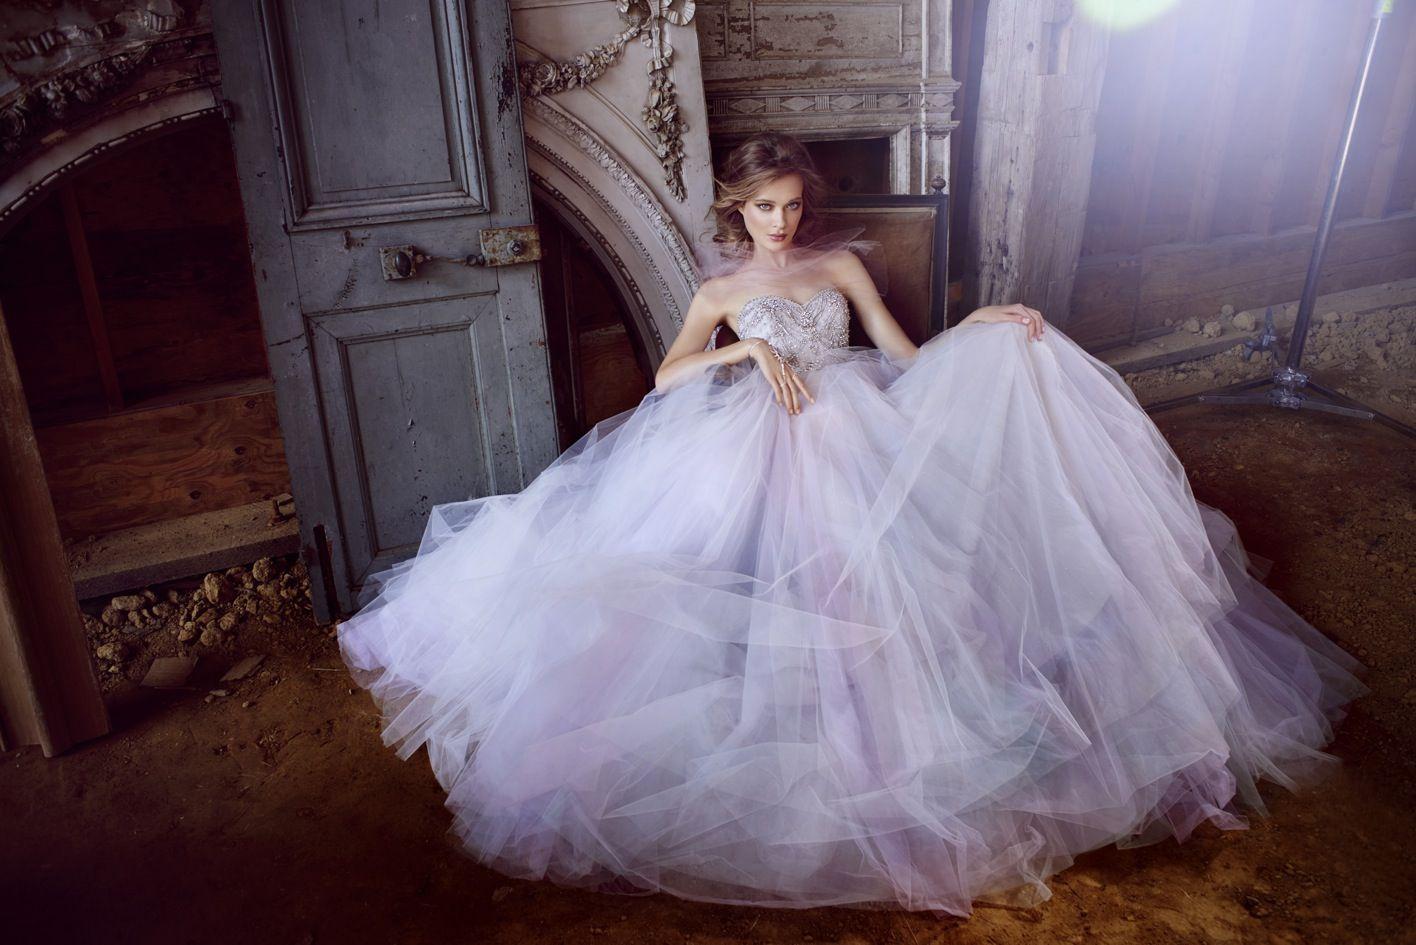 Lazaro 2015 Bridal Collection - Designer Wedding Dress - Sweetheart Neckline Ball Gown With Gemstones Details. Available at Designer Bridal Room, Hong Kong.